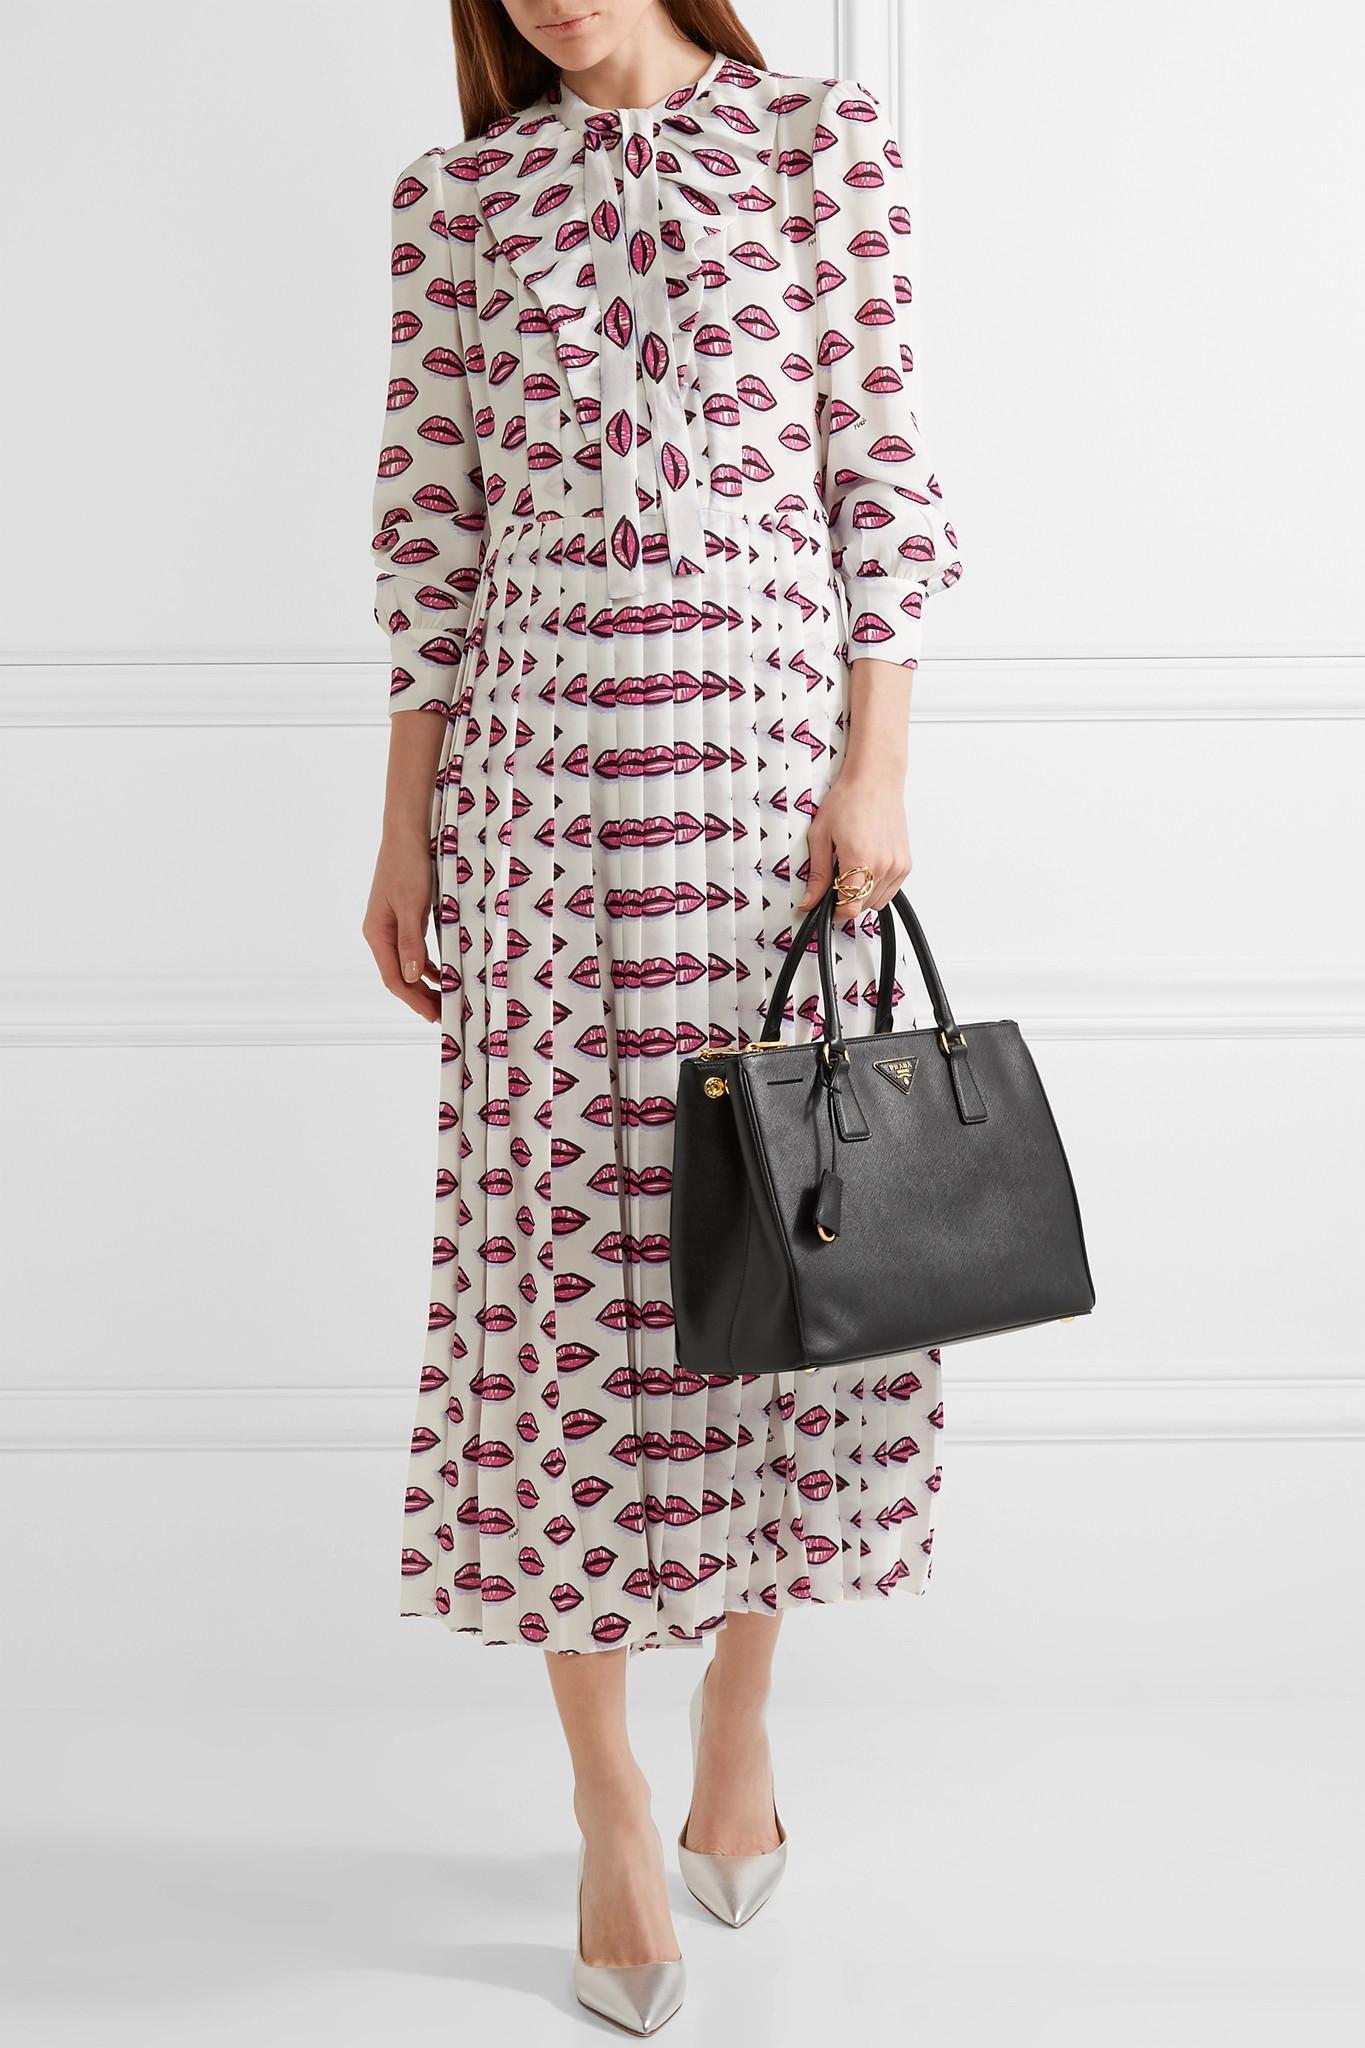 2c268a6ccd8e Lyst - Prada Galleria Medium Textured-Leather Tote in Black - Save 21%